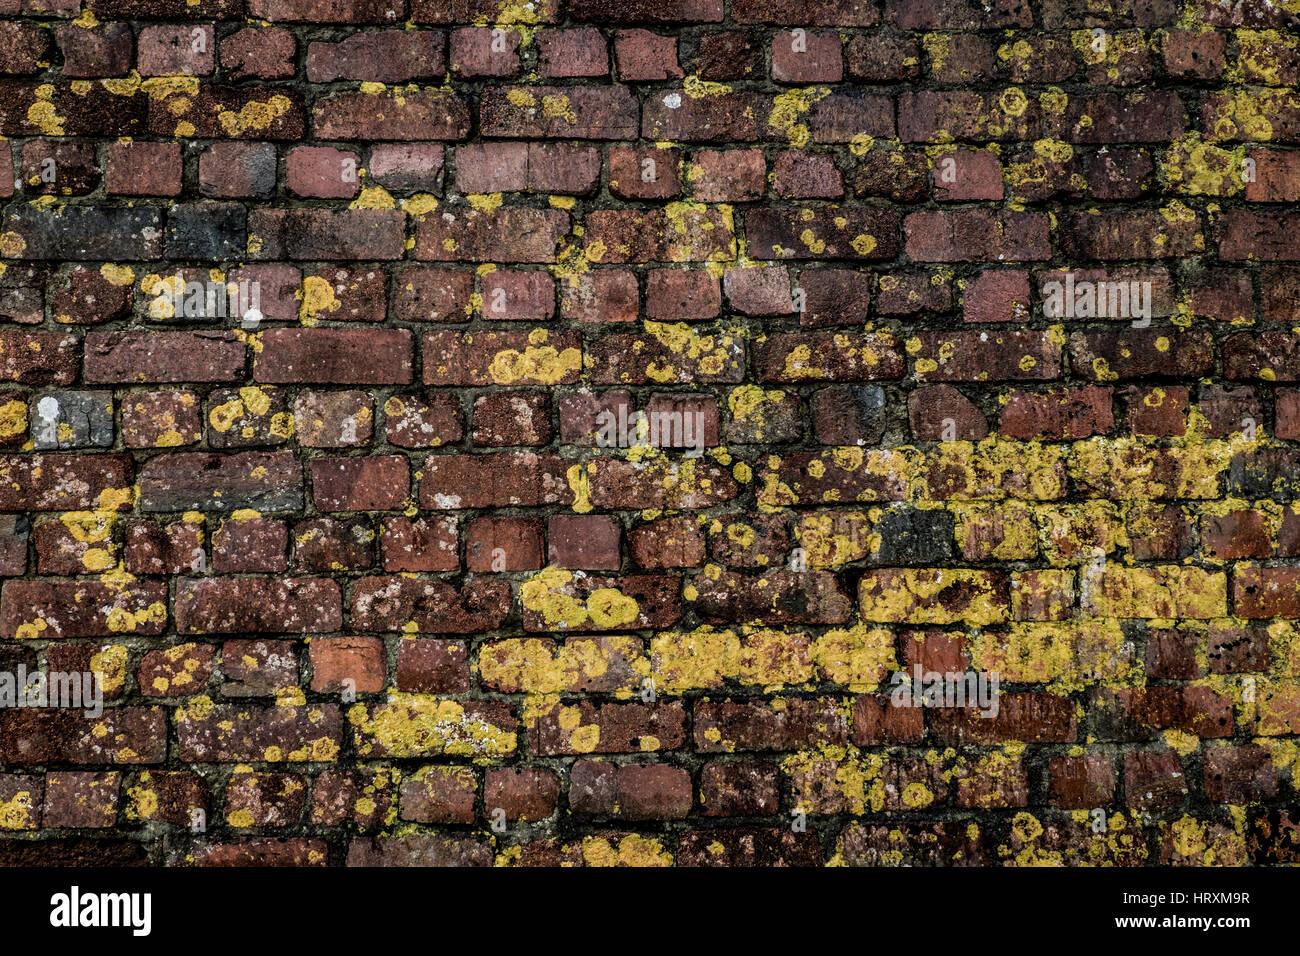 Lichen covered brick wall at Porthgain - Stock Image